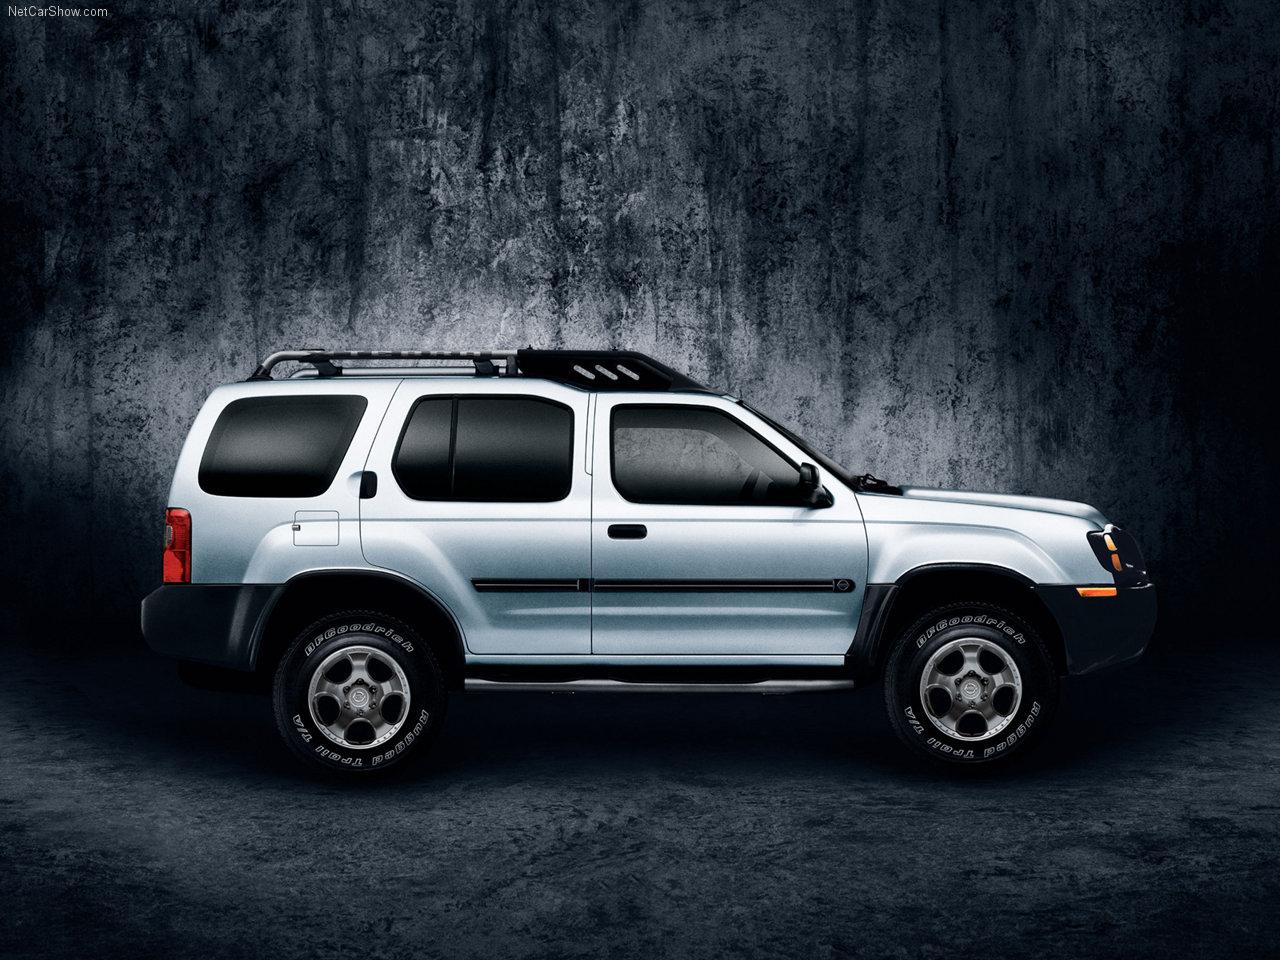 http://4.bp.blogspot.com/-hTN3F9PybEk/TX-R7tCM8VI/AAAAAAAAF2I/Ynq3mTTVBJ4/s1600/Nissan-Xterra_2003_1280x960_wallpaper_05.jpg